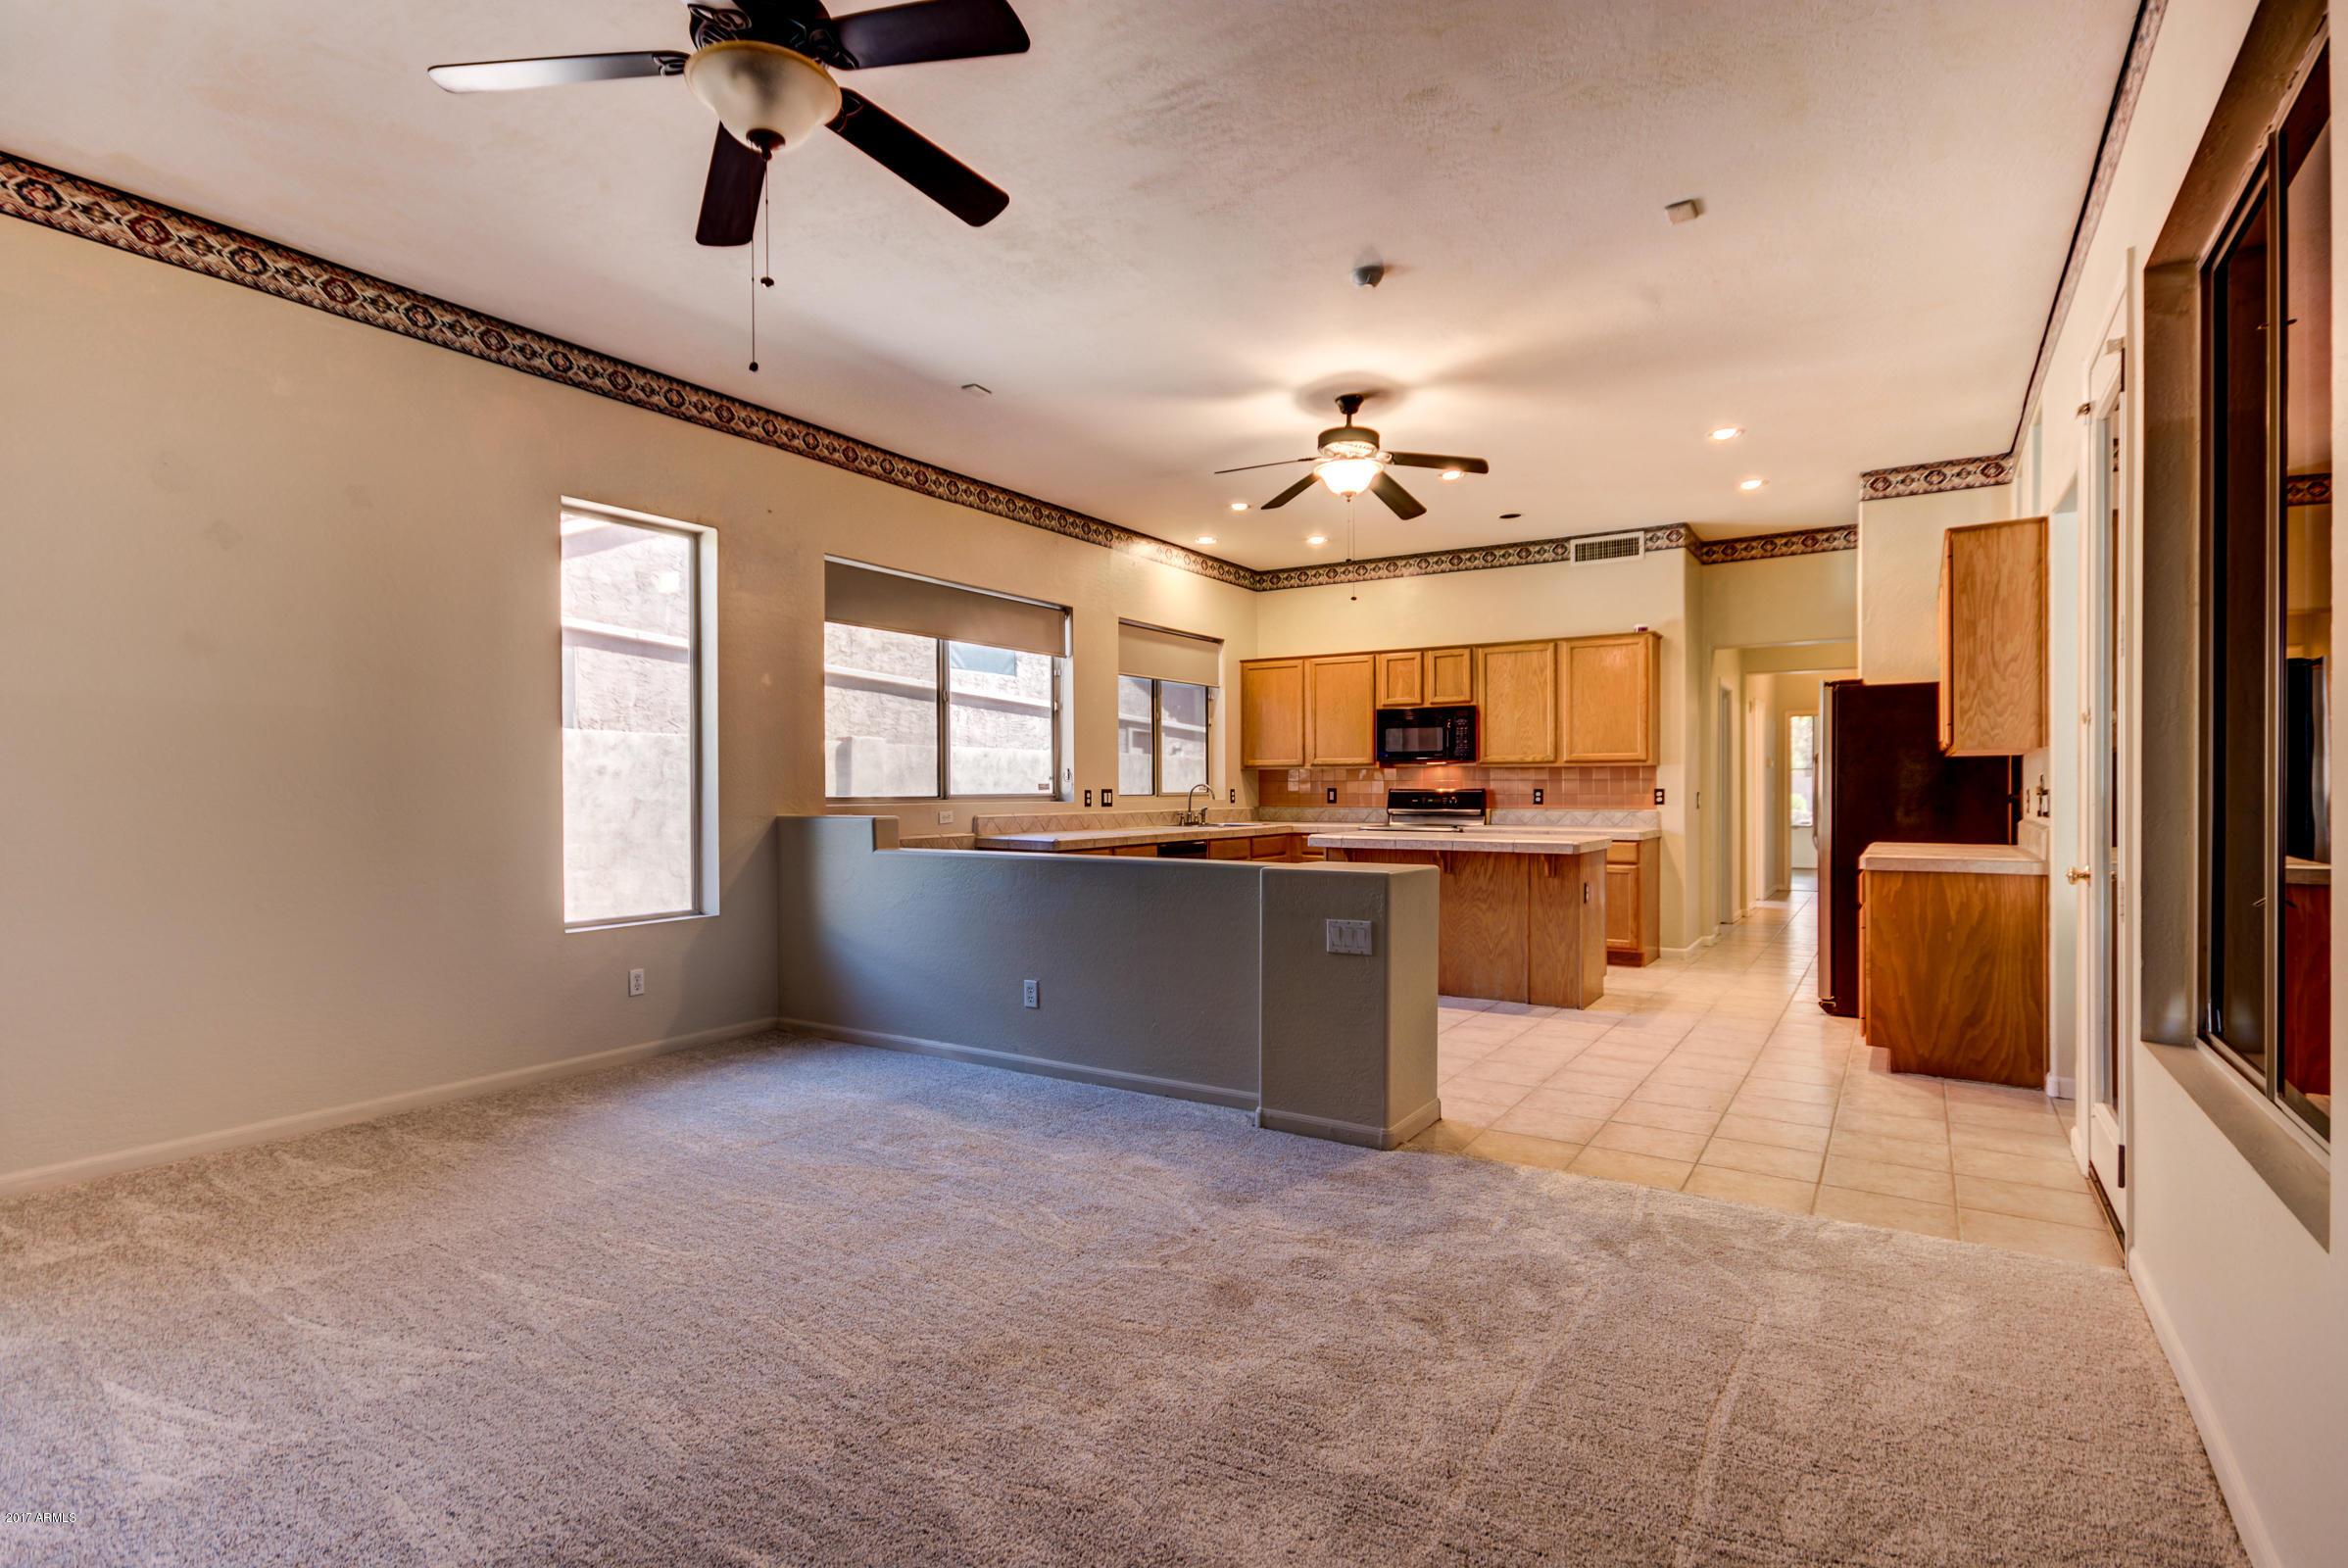 304 S Ironwood  Street Gilbert, AZ 85296 - img20